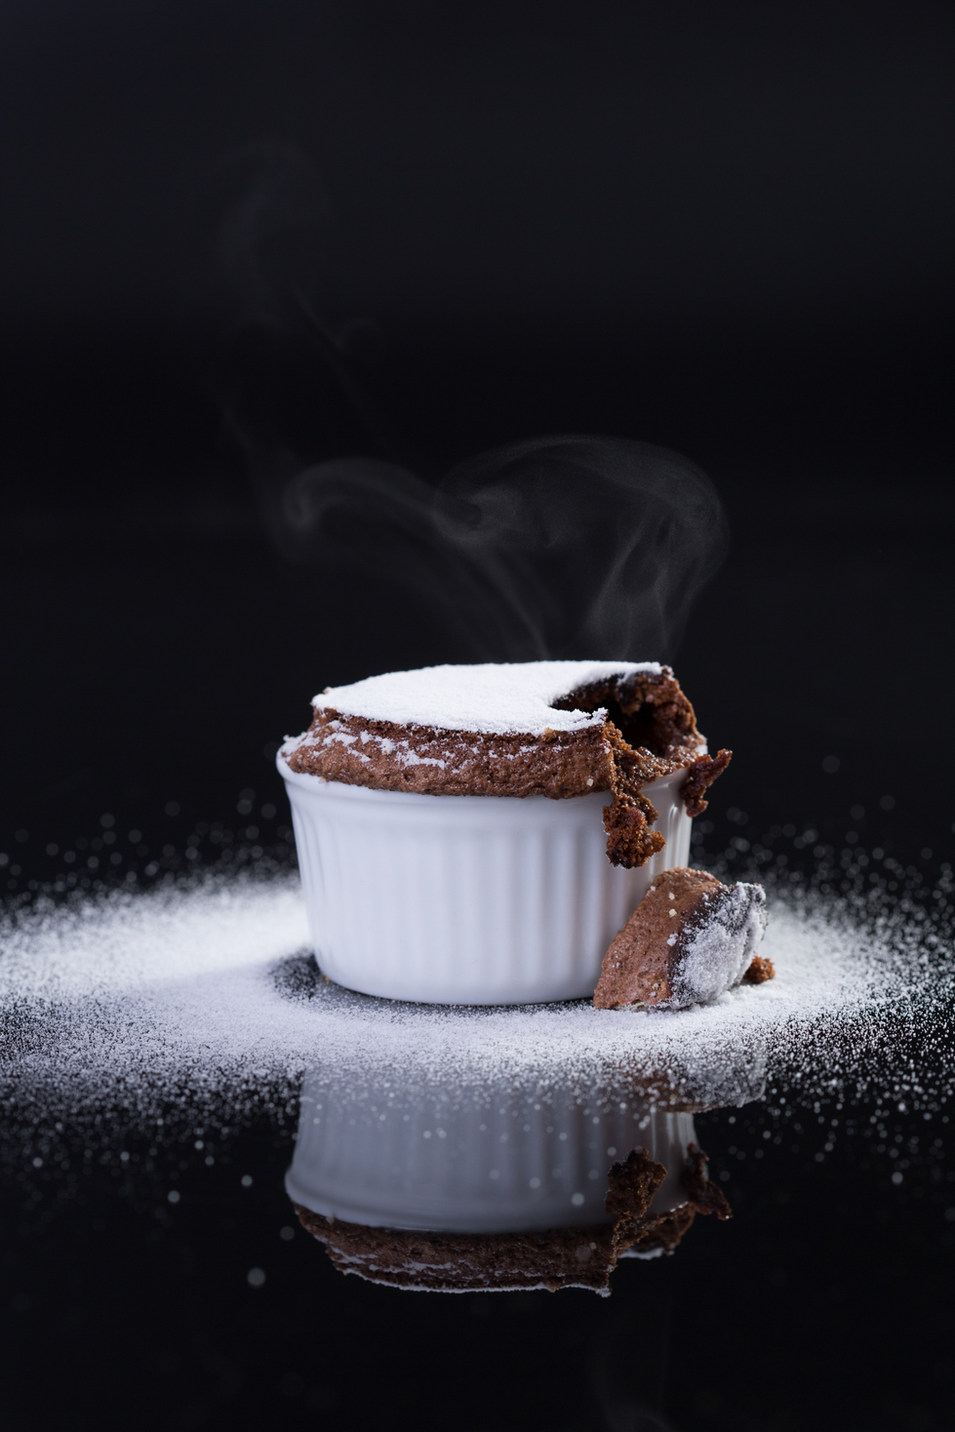 Livro Senac Manual de Confeitaria - Food styling